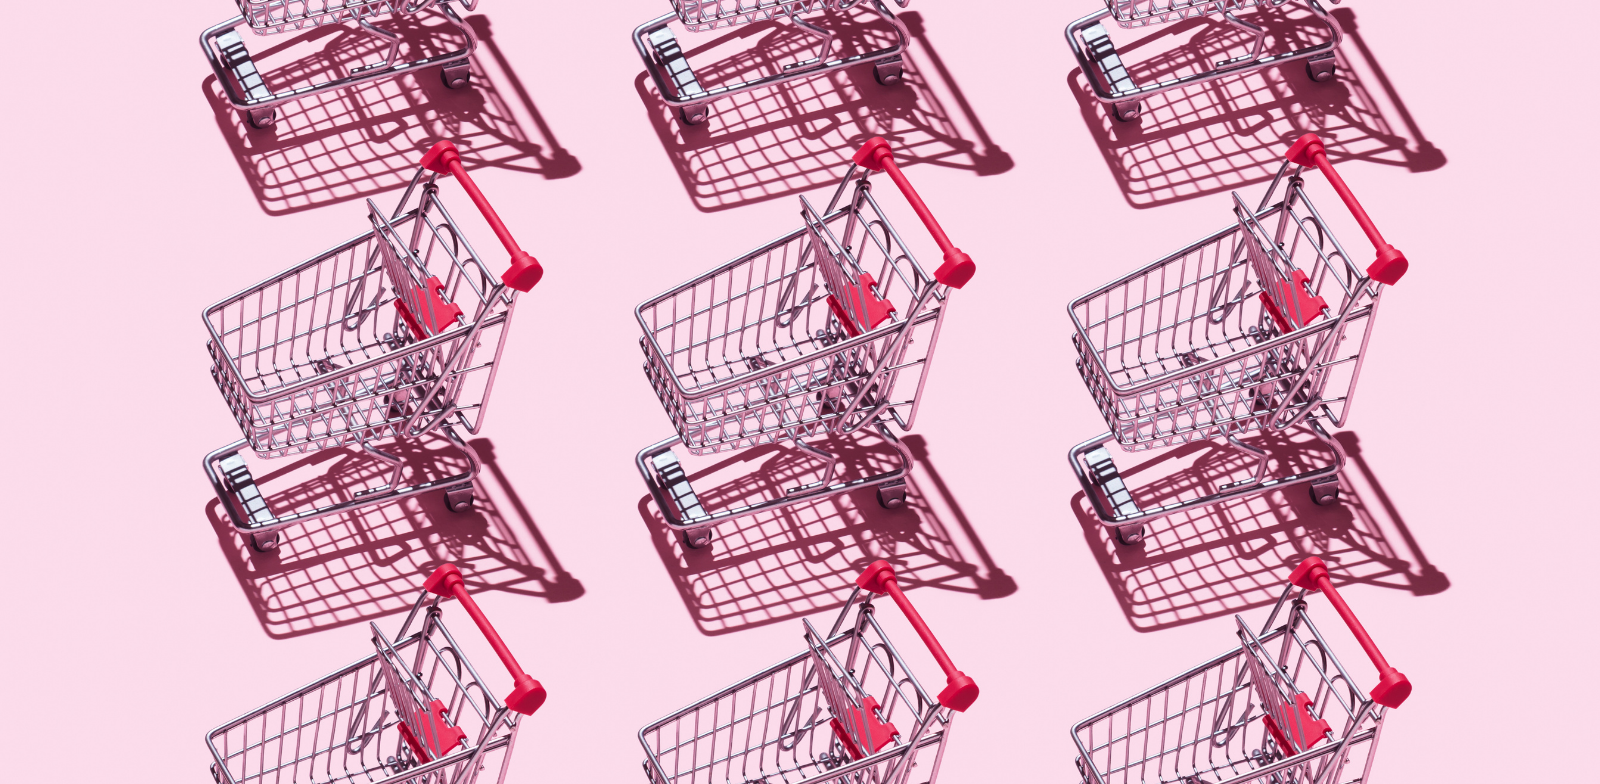 Promotions Teardown – Cart Abandonment Promotions